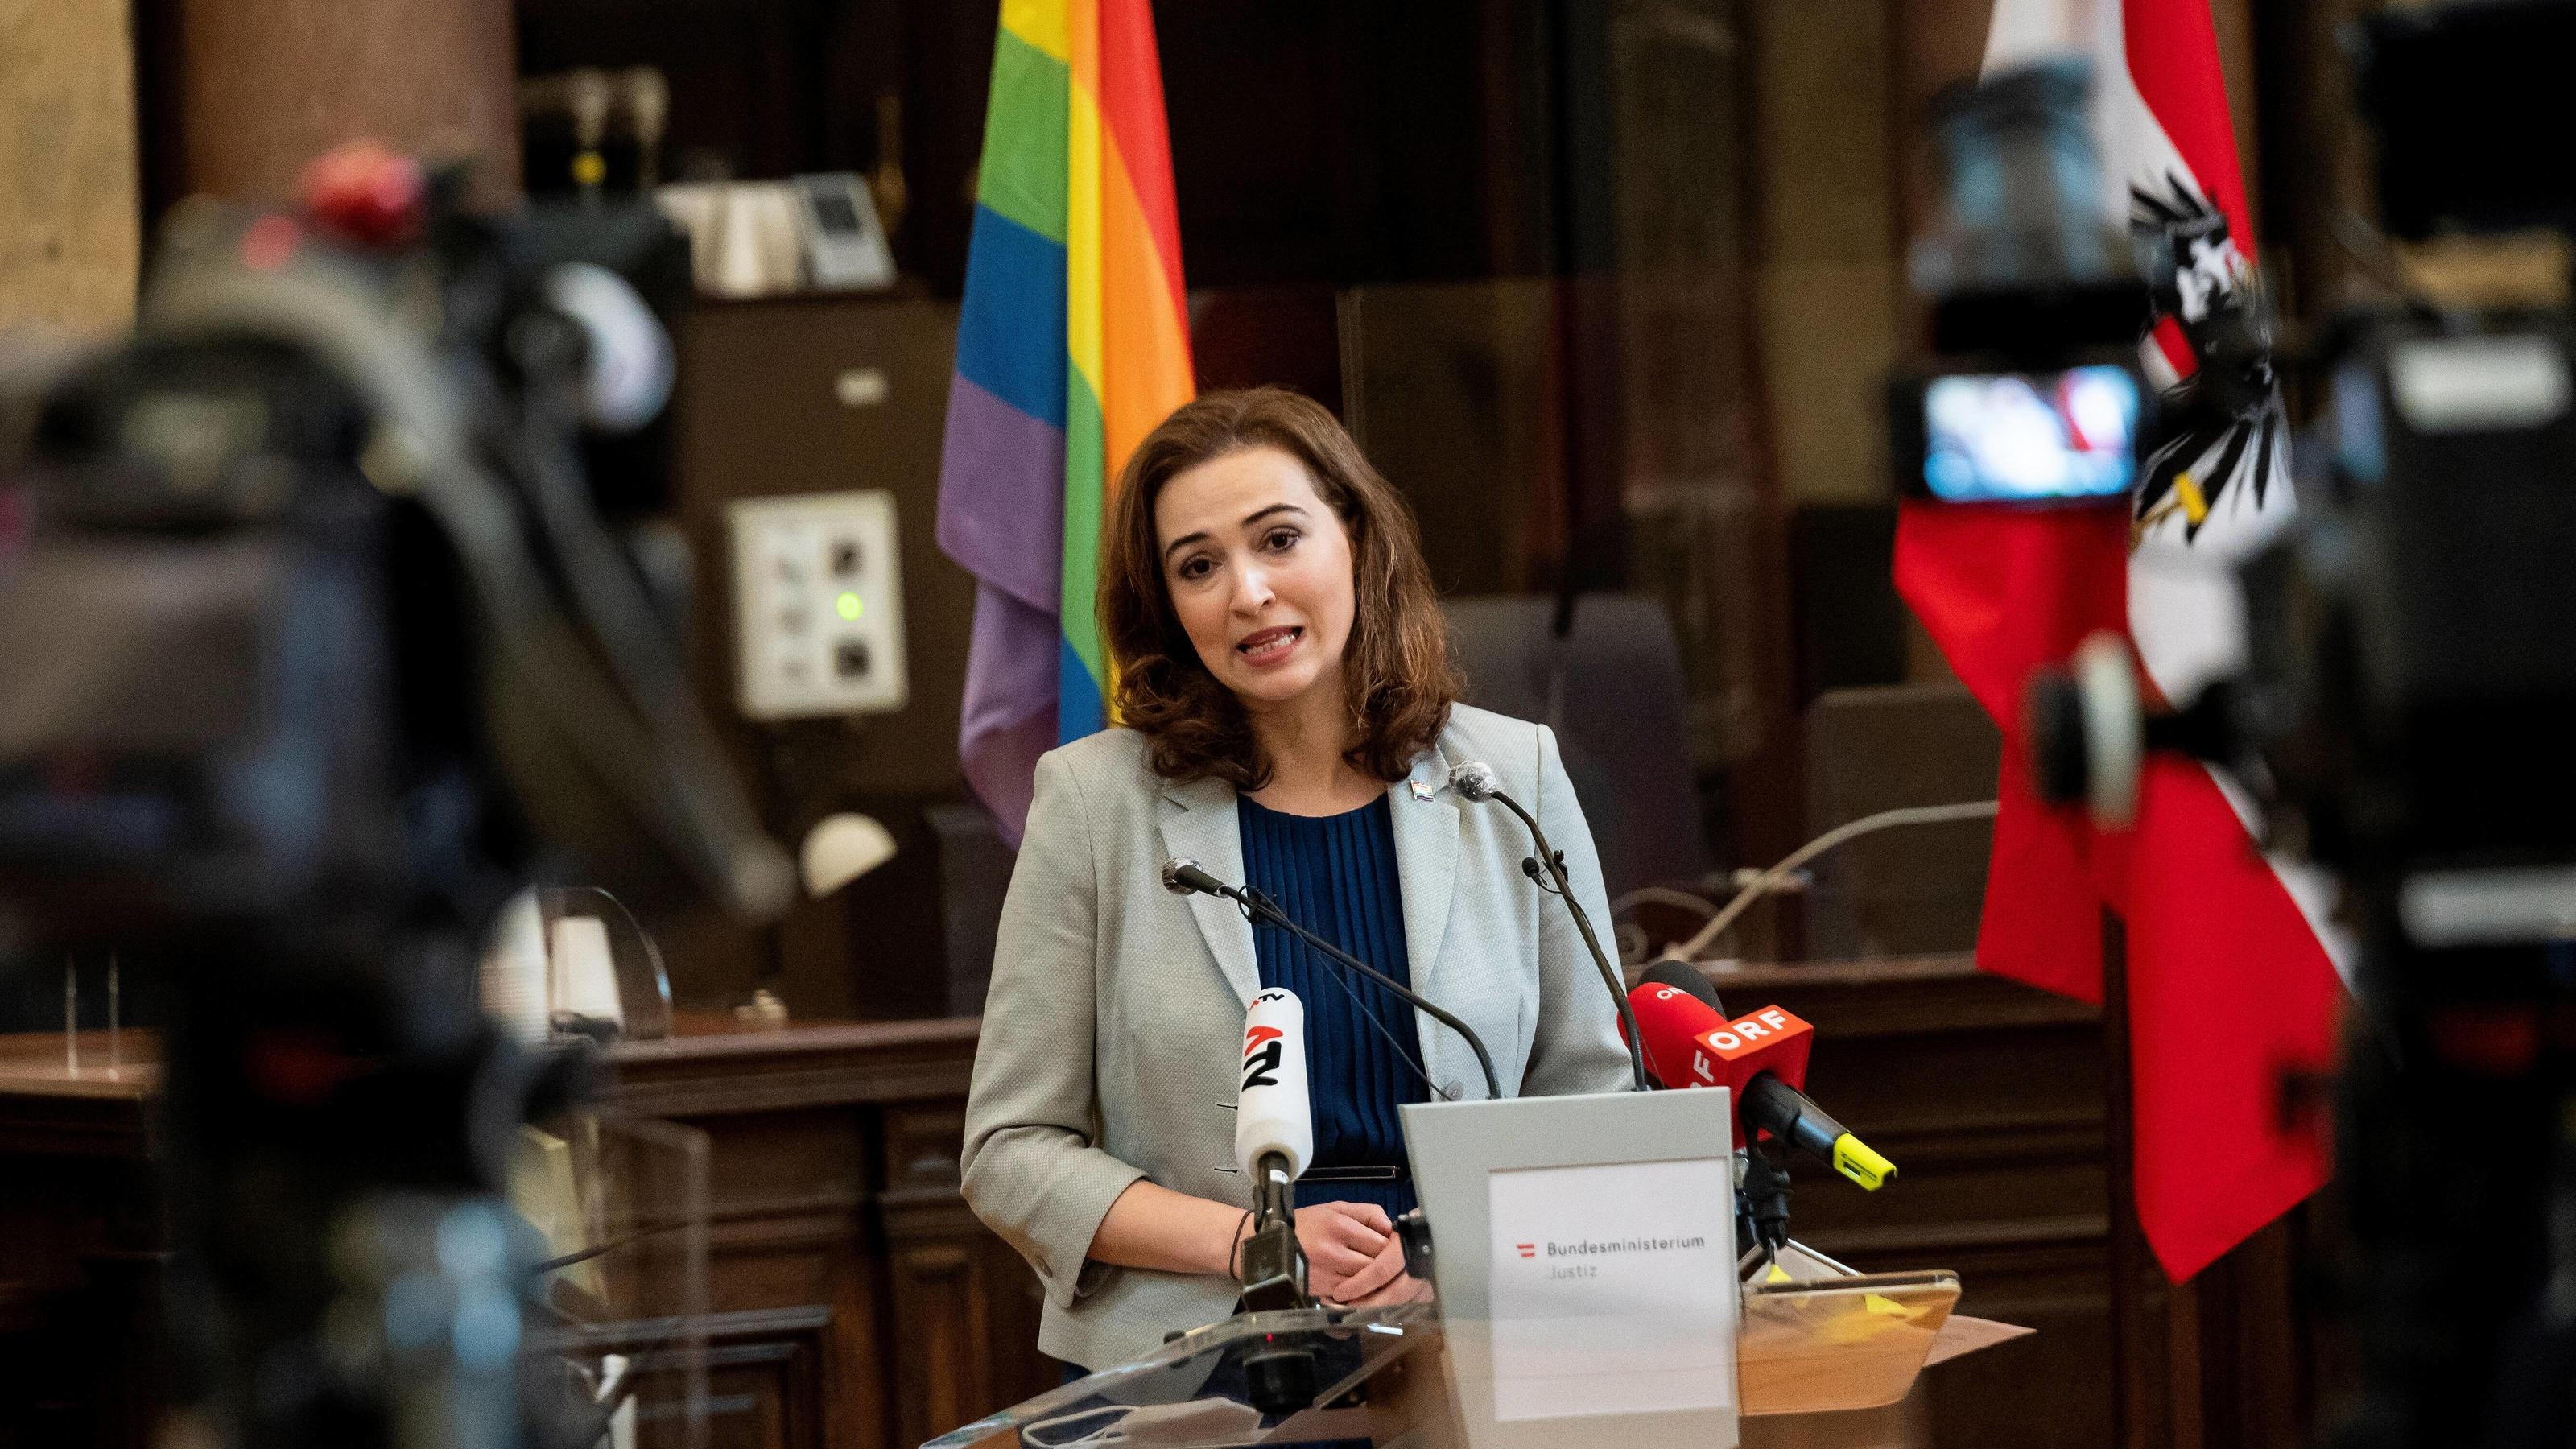 Österreichs Justizministerin Alma Zadic